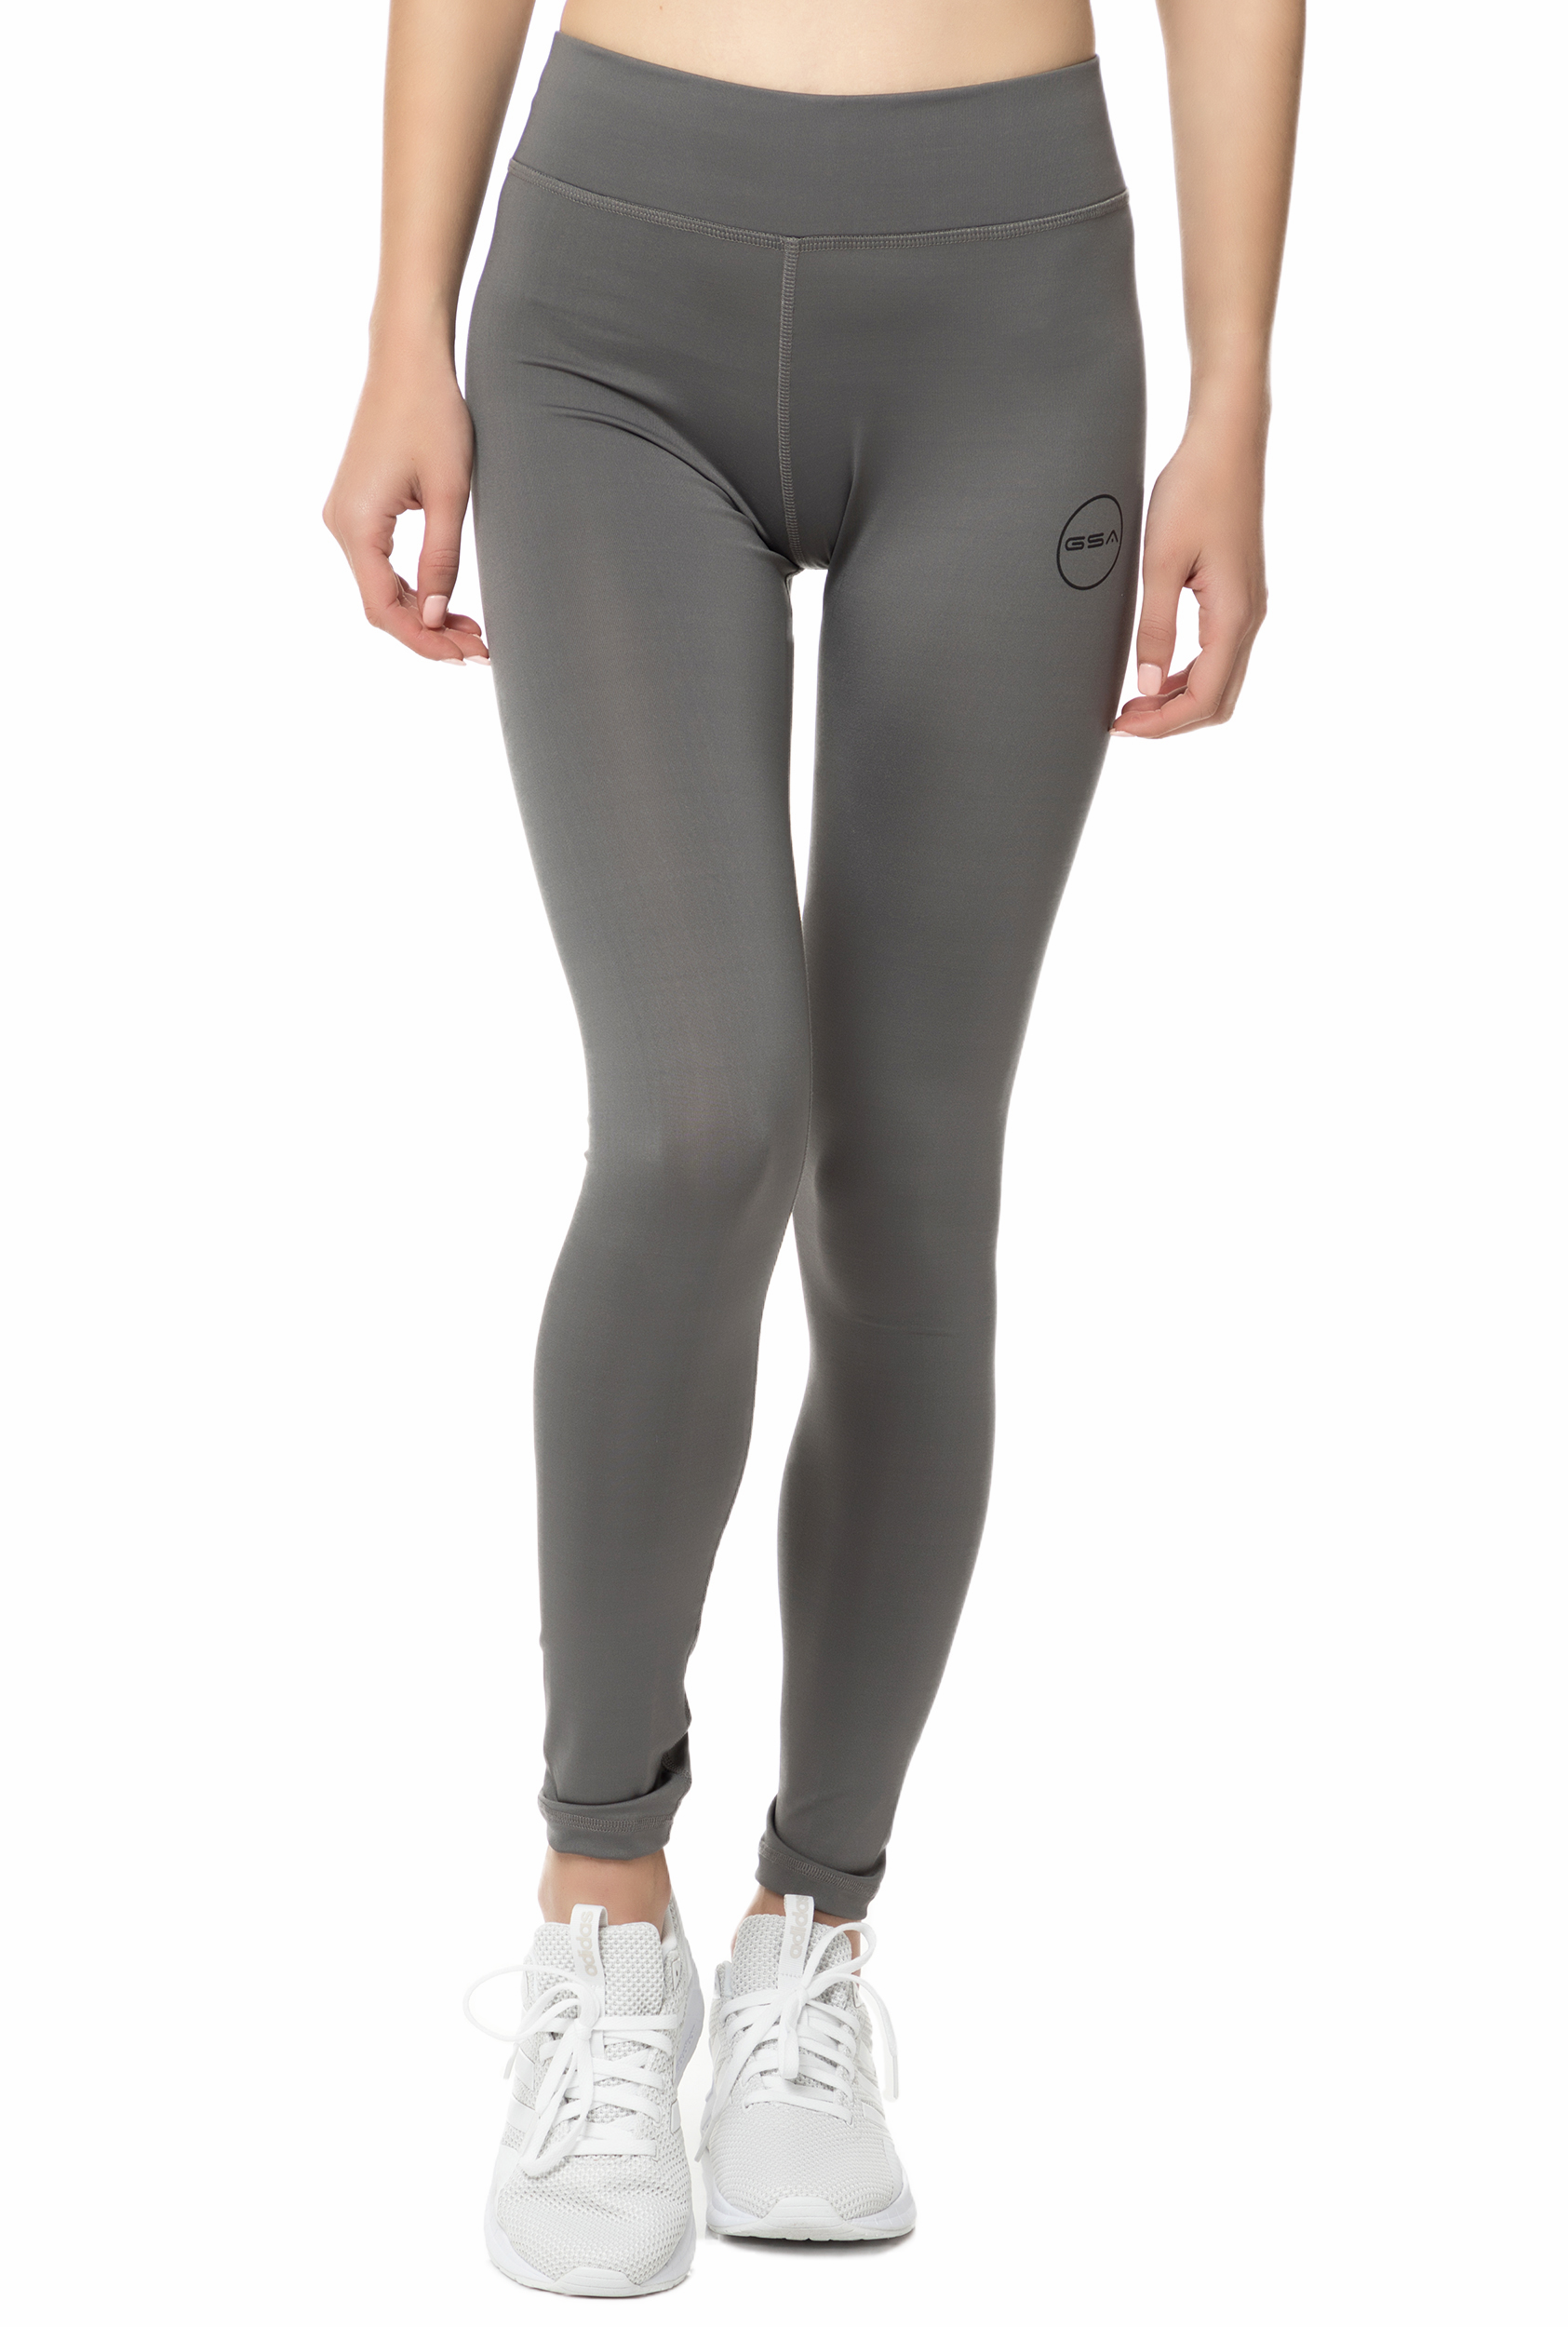 63581248c524 GSA - Γυναικεία Αθλητικά Ρούχα